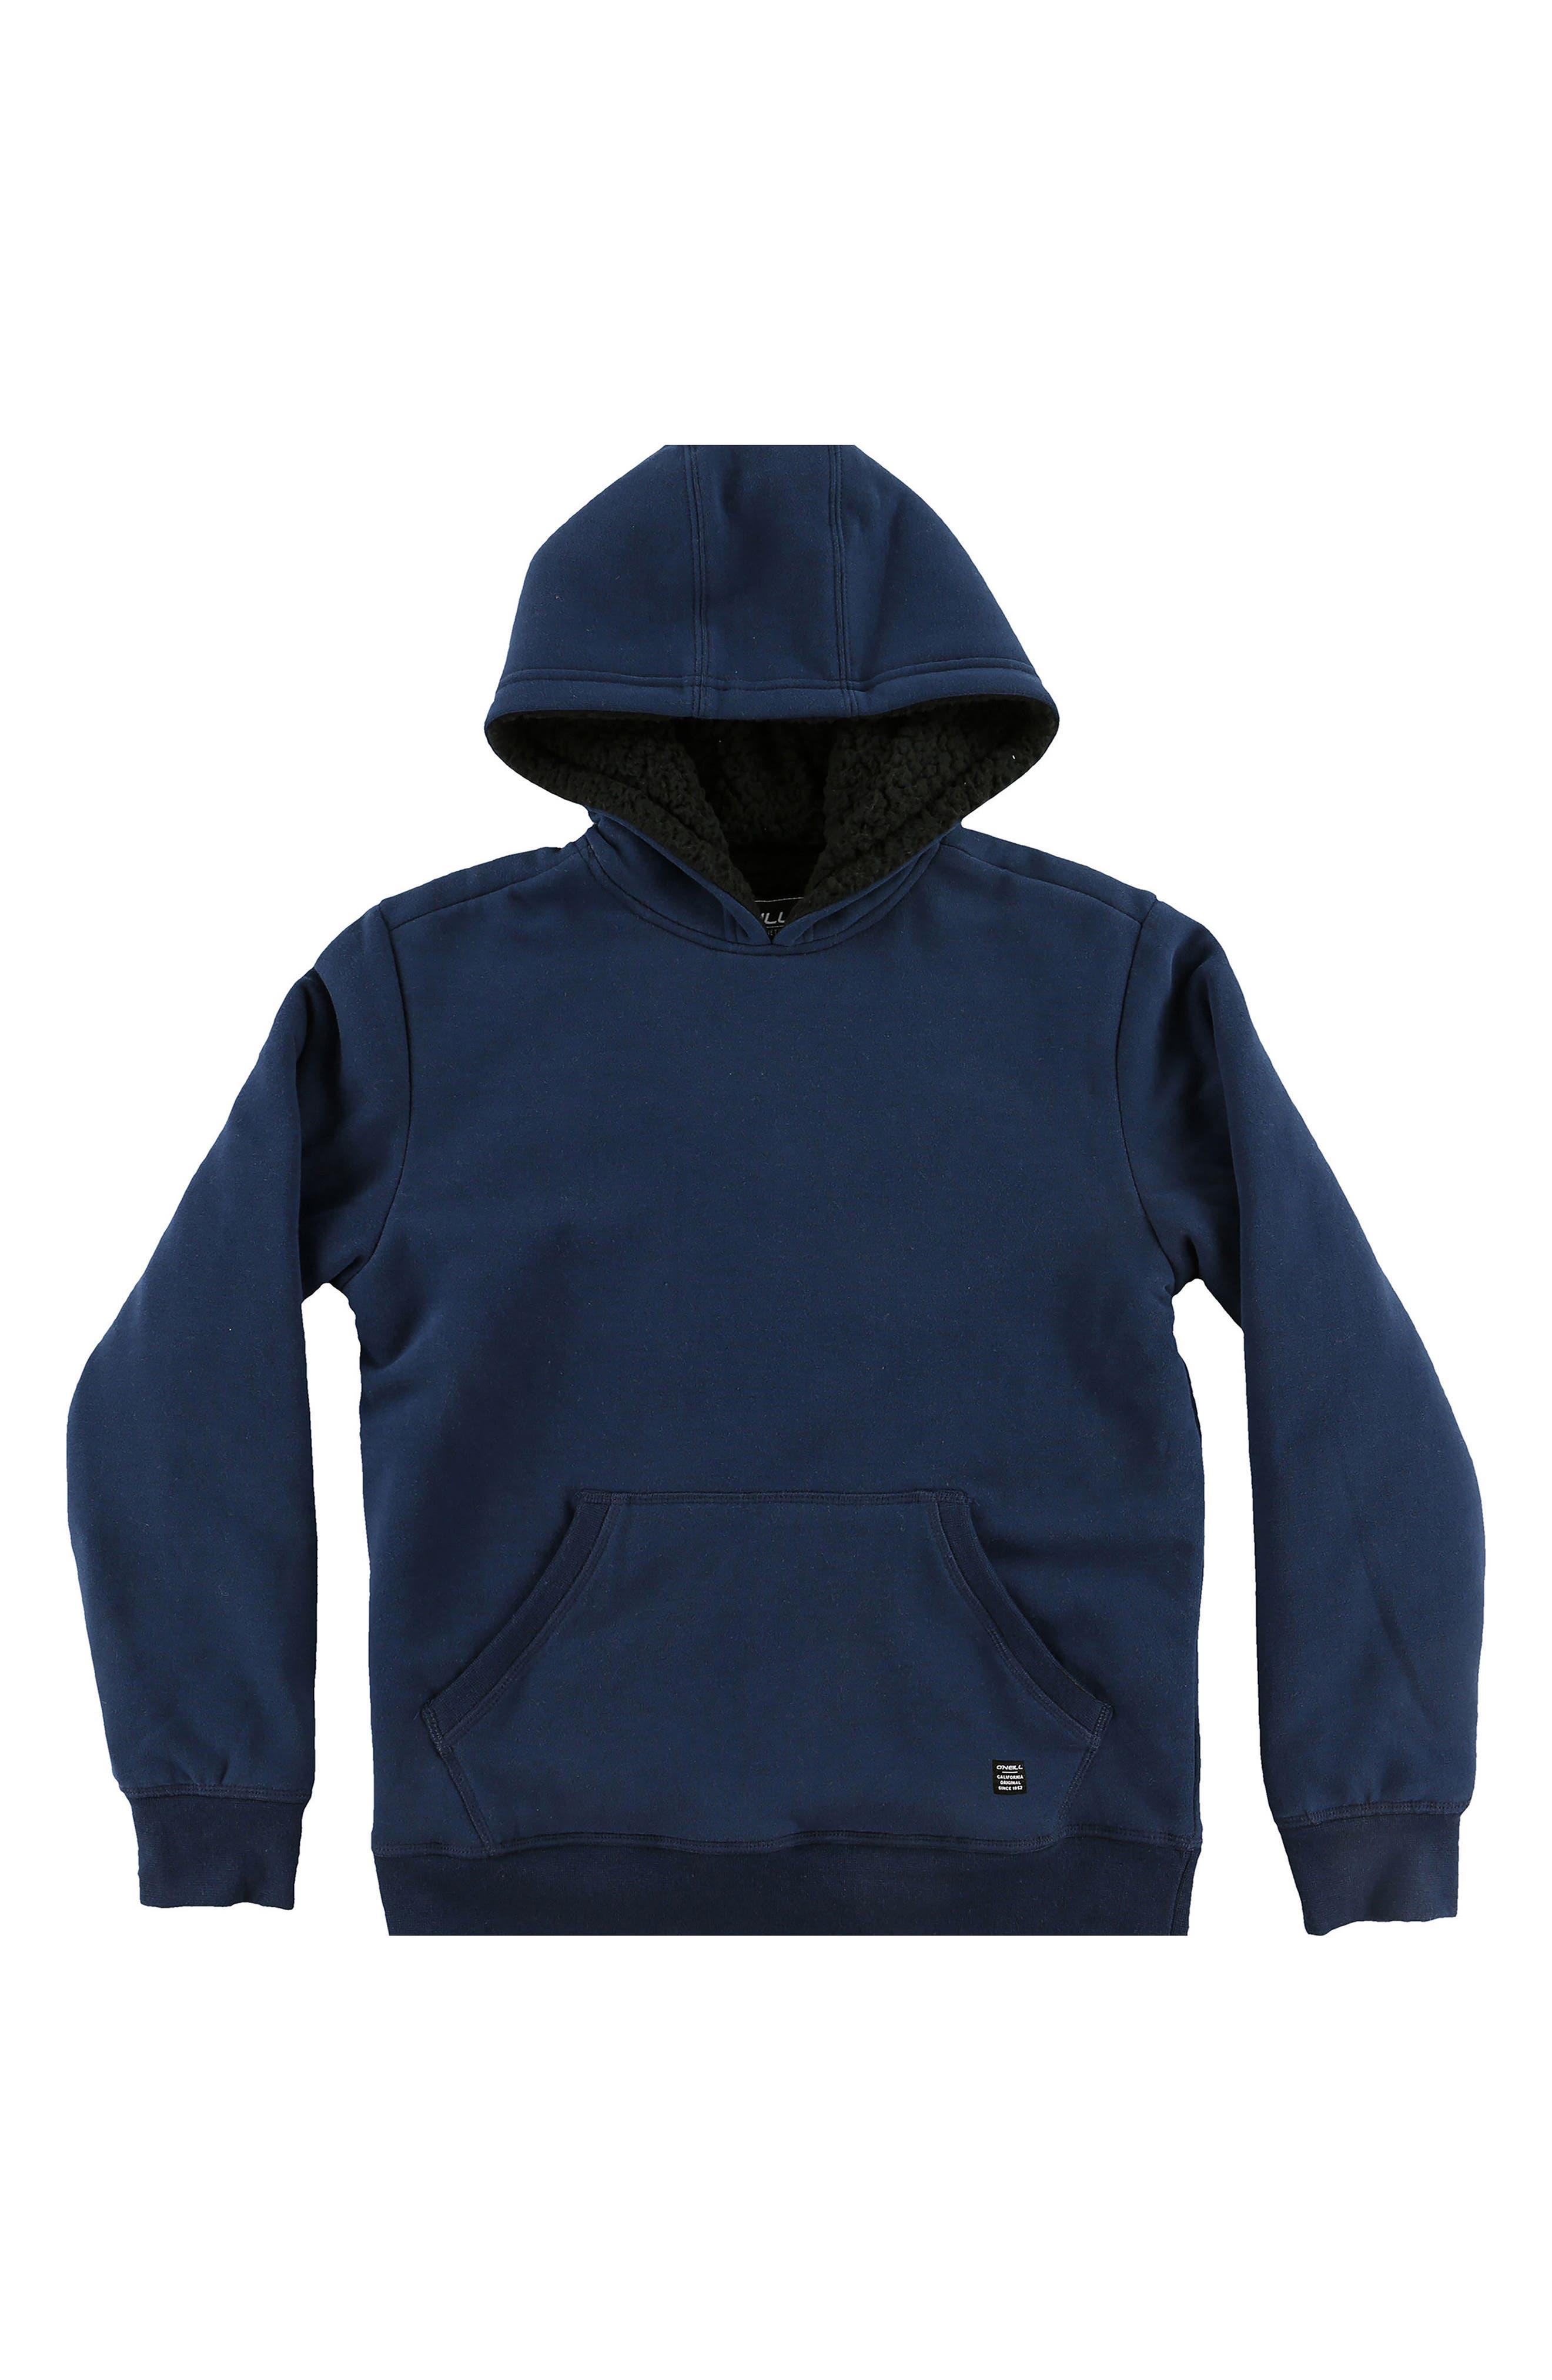 O'Neill Staple Plush Lined Pullover Hoodie (Big Boys)